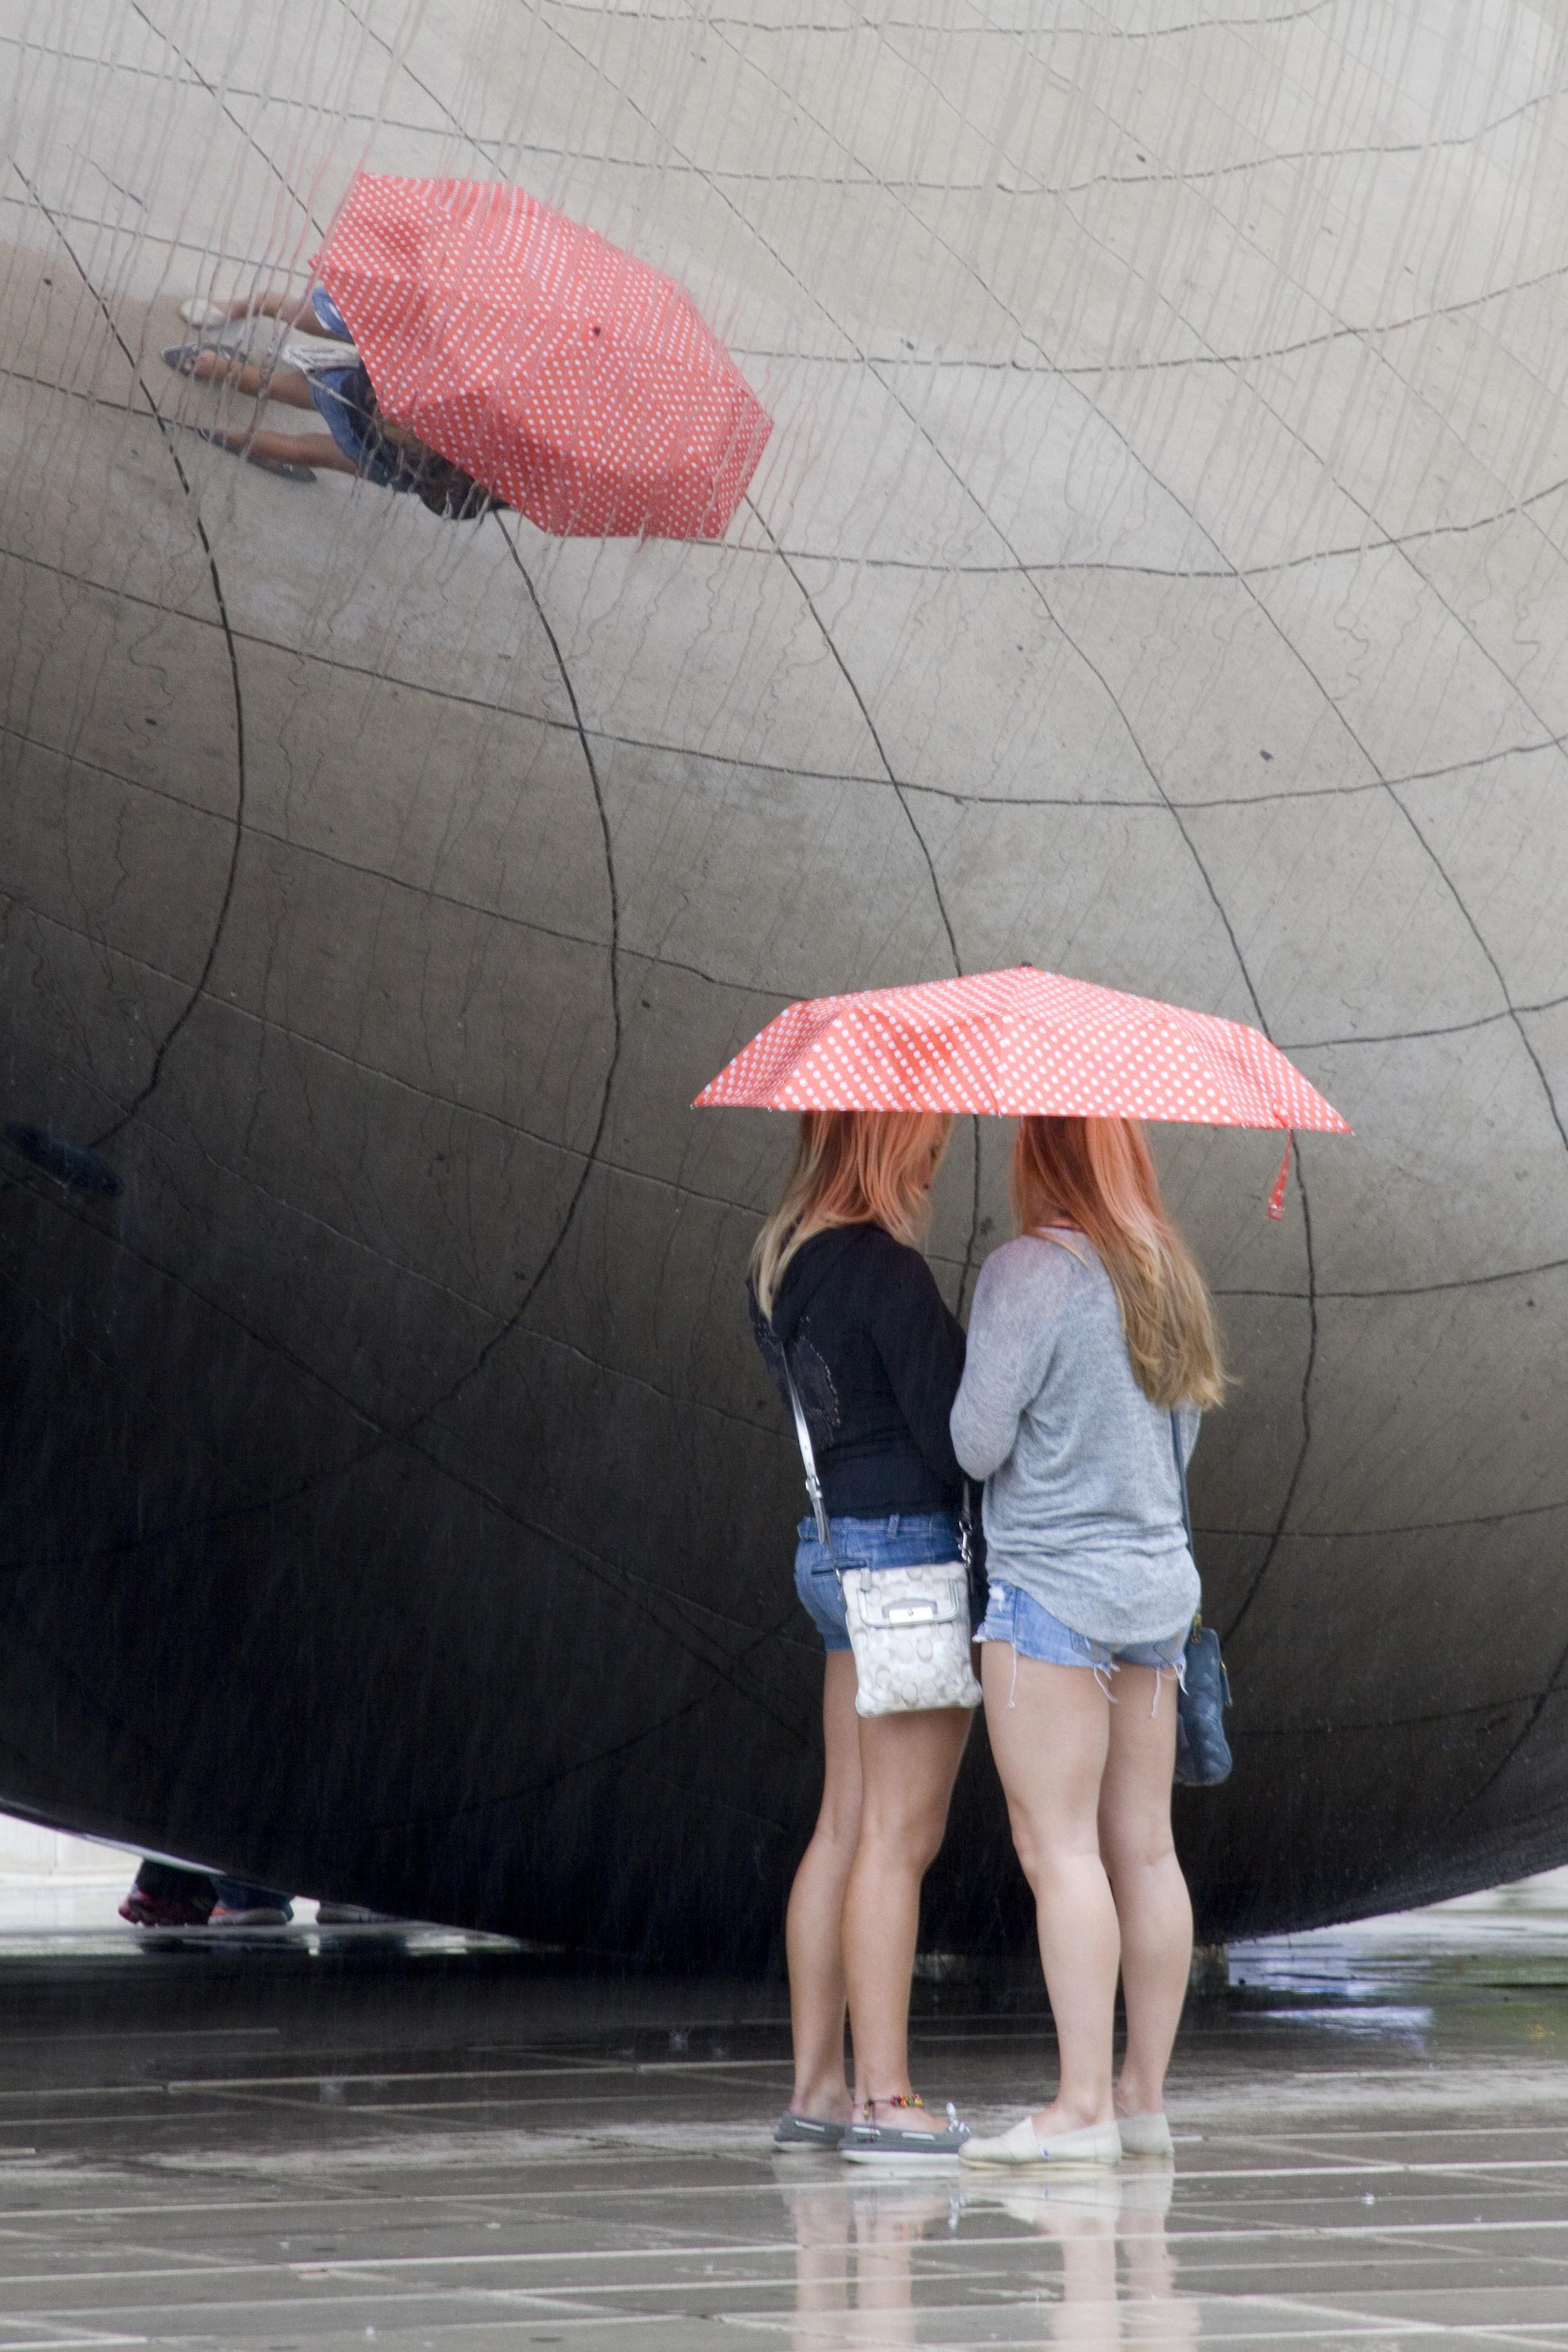 Chicago Rain - 2.jpg